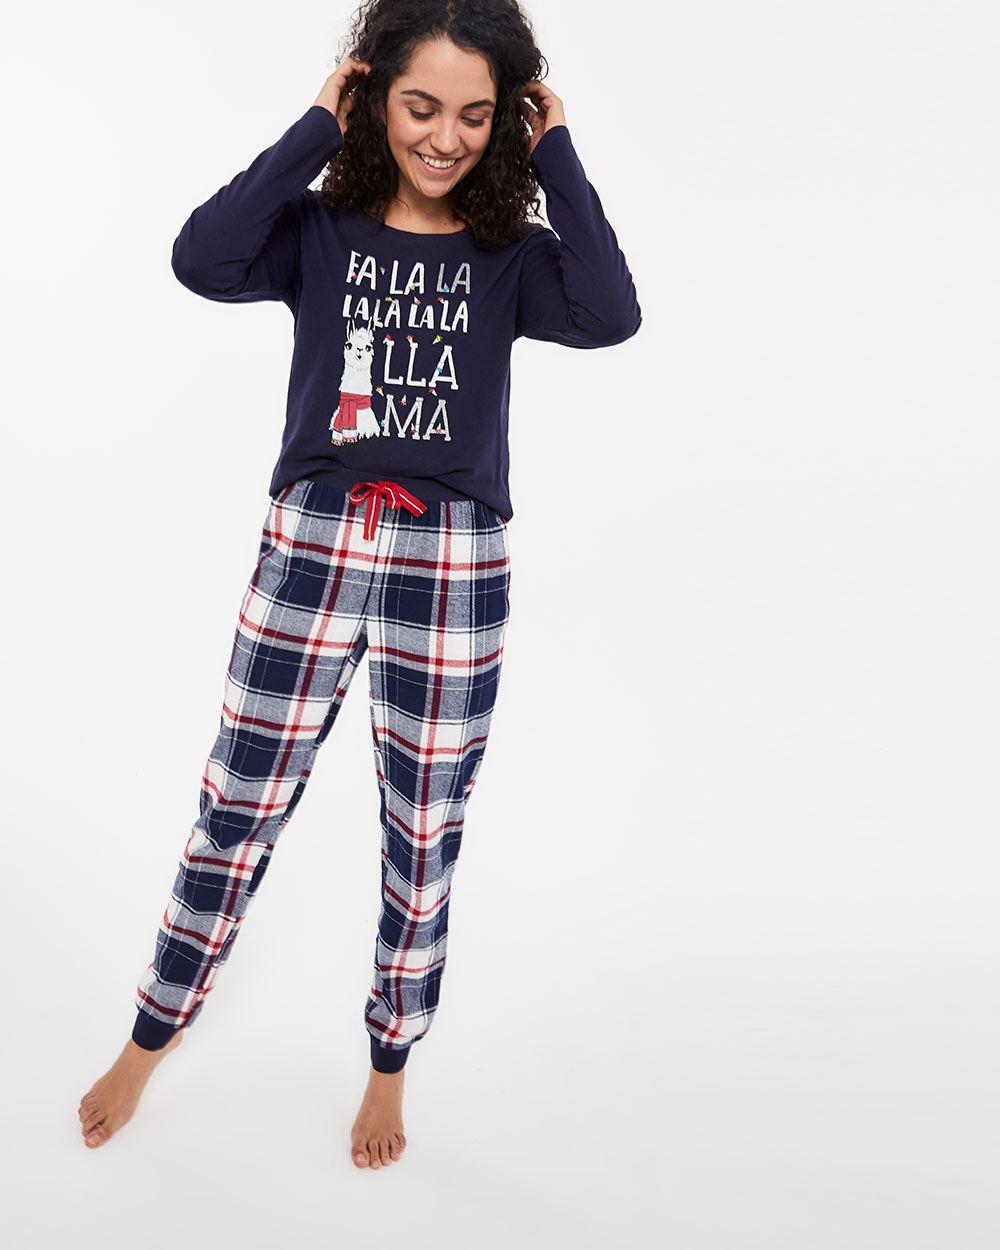 Ensemble-pyjama en coton imprimé  72dbe0b6338